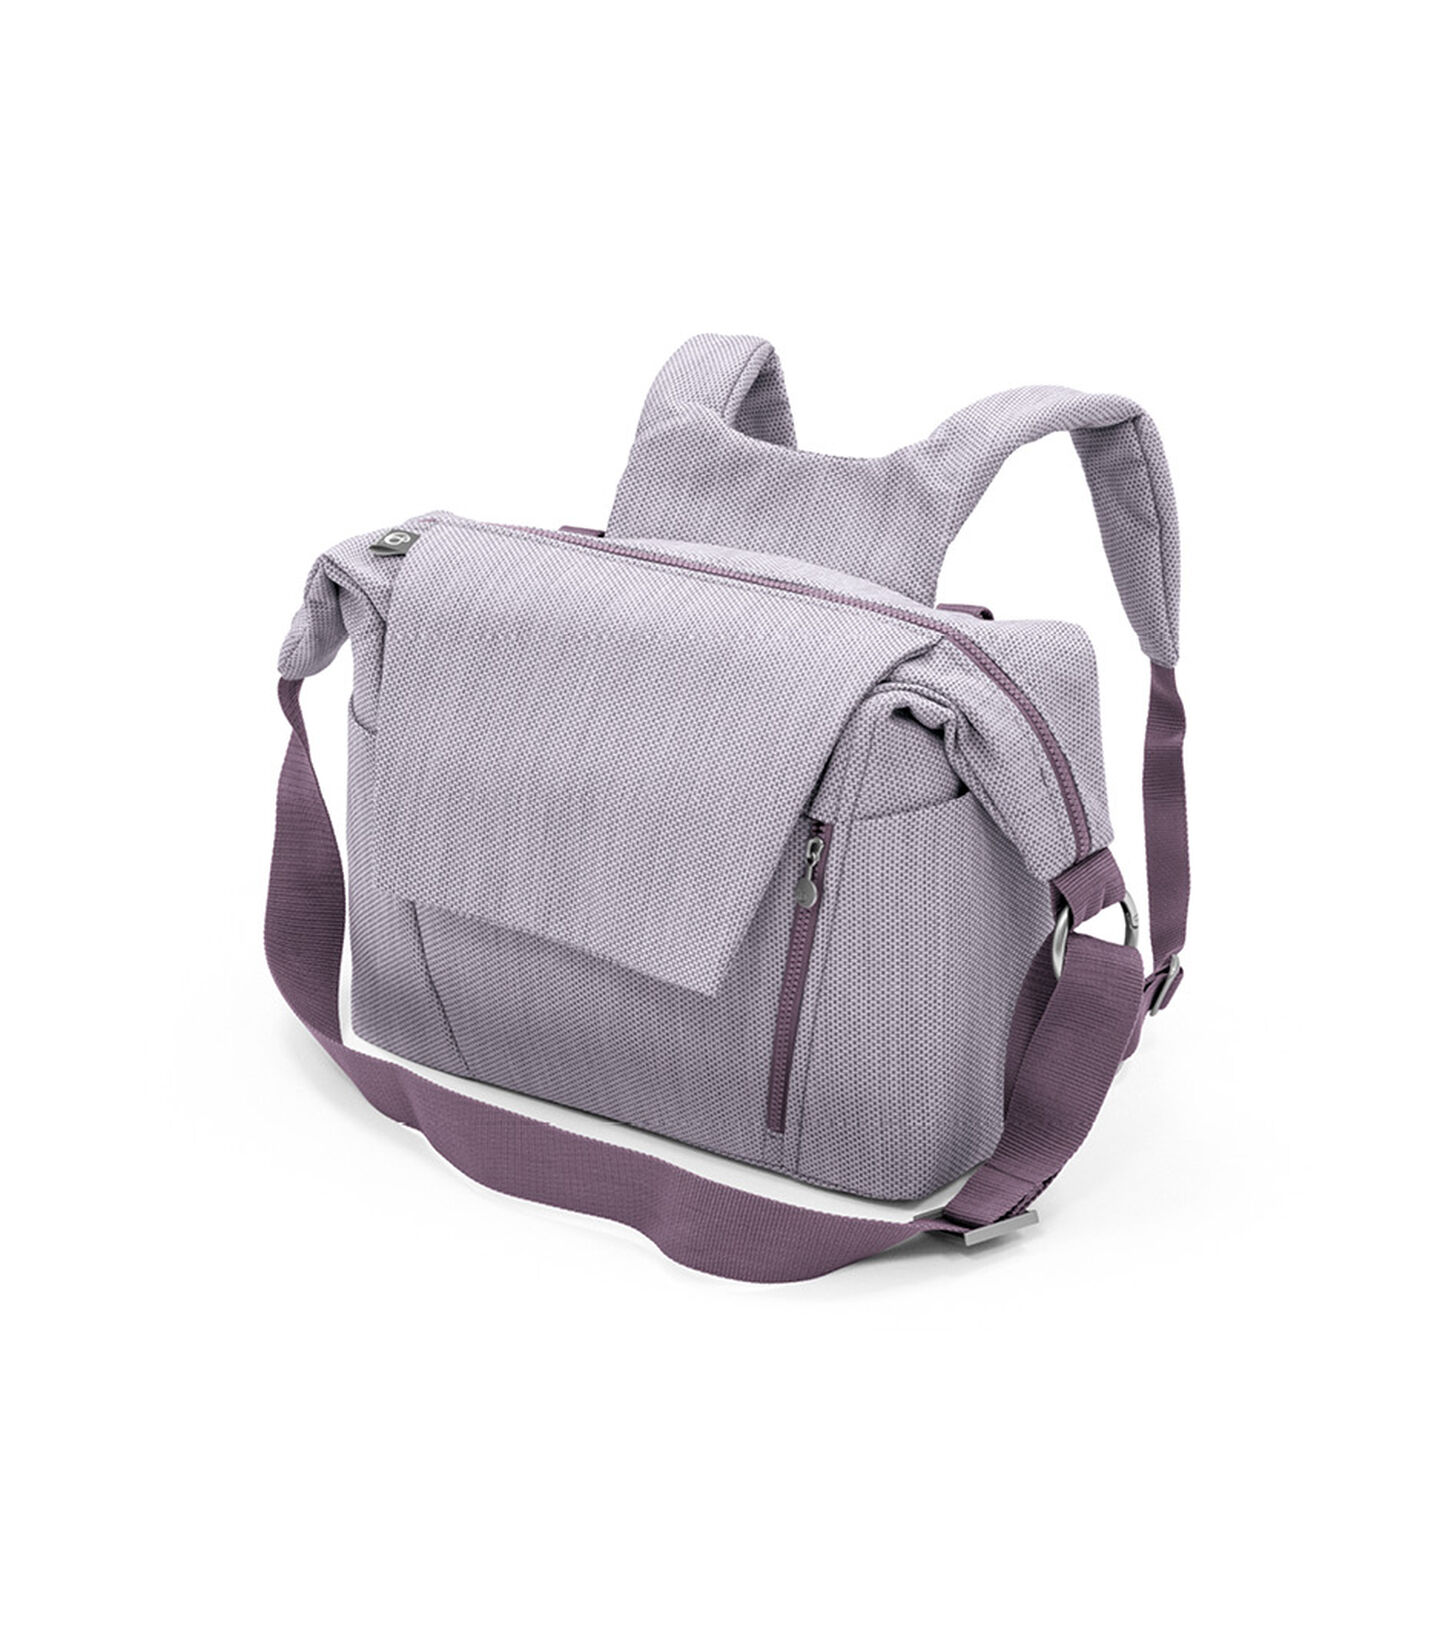 Stokke® Stroller Changing Bag, Brushed Lilac. view 2